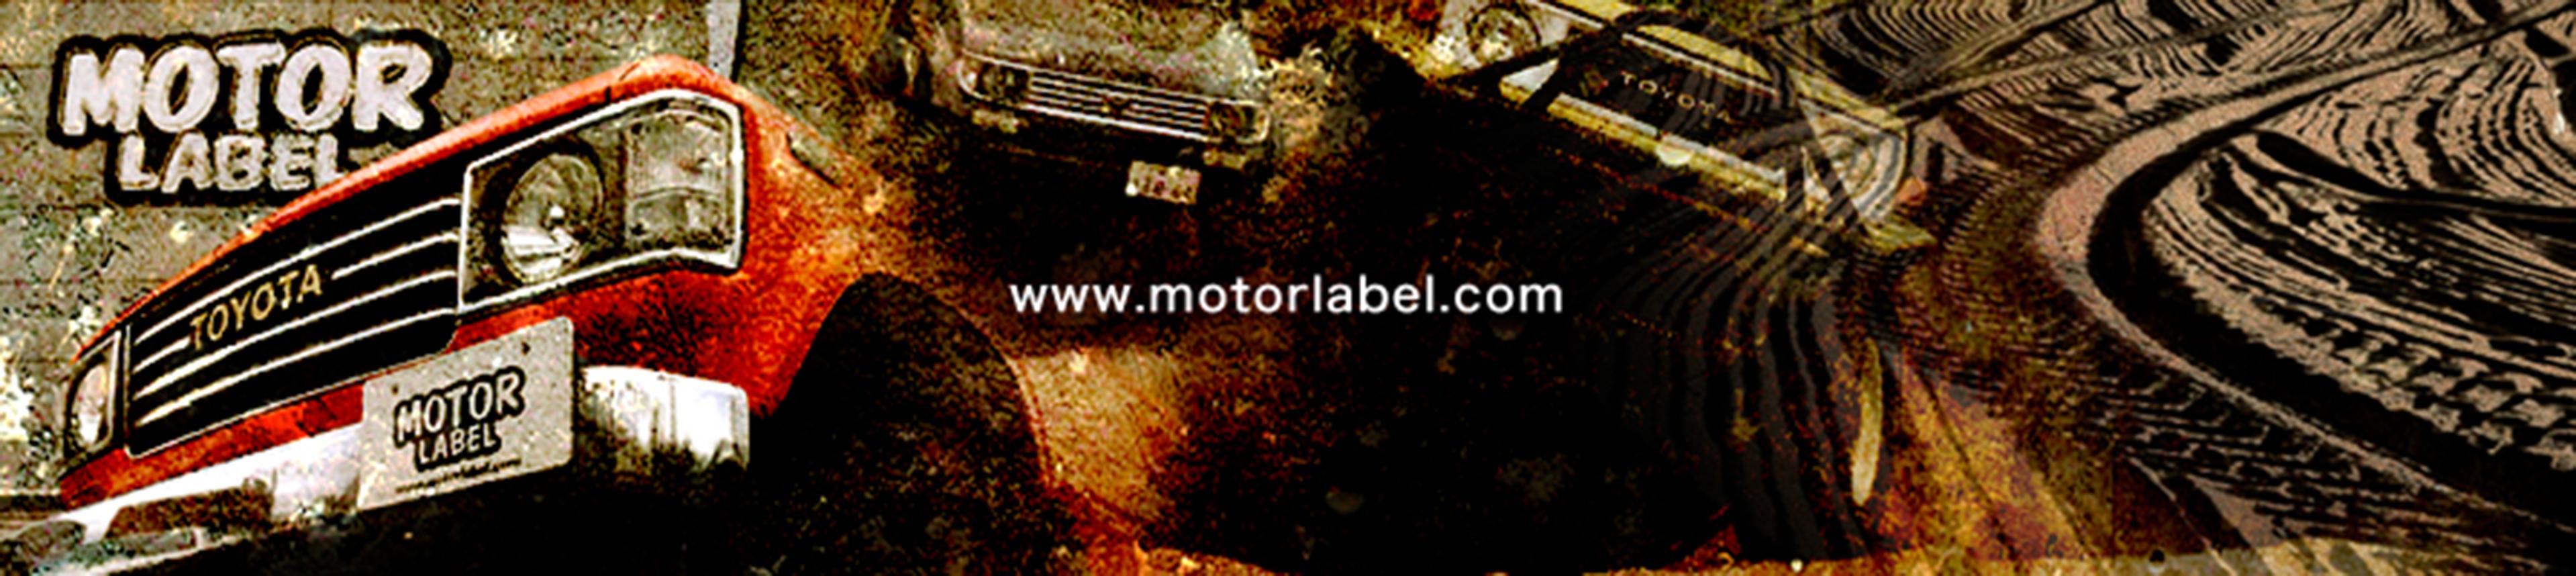 www.motorlabel.com